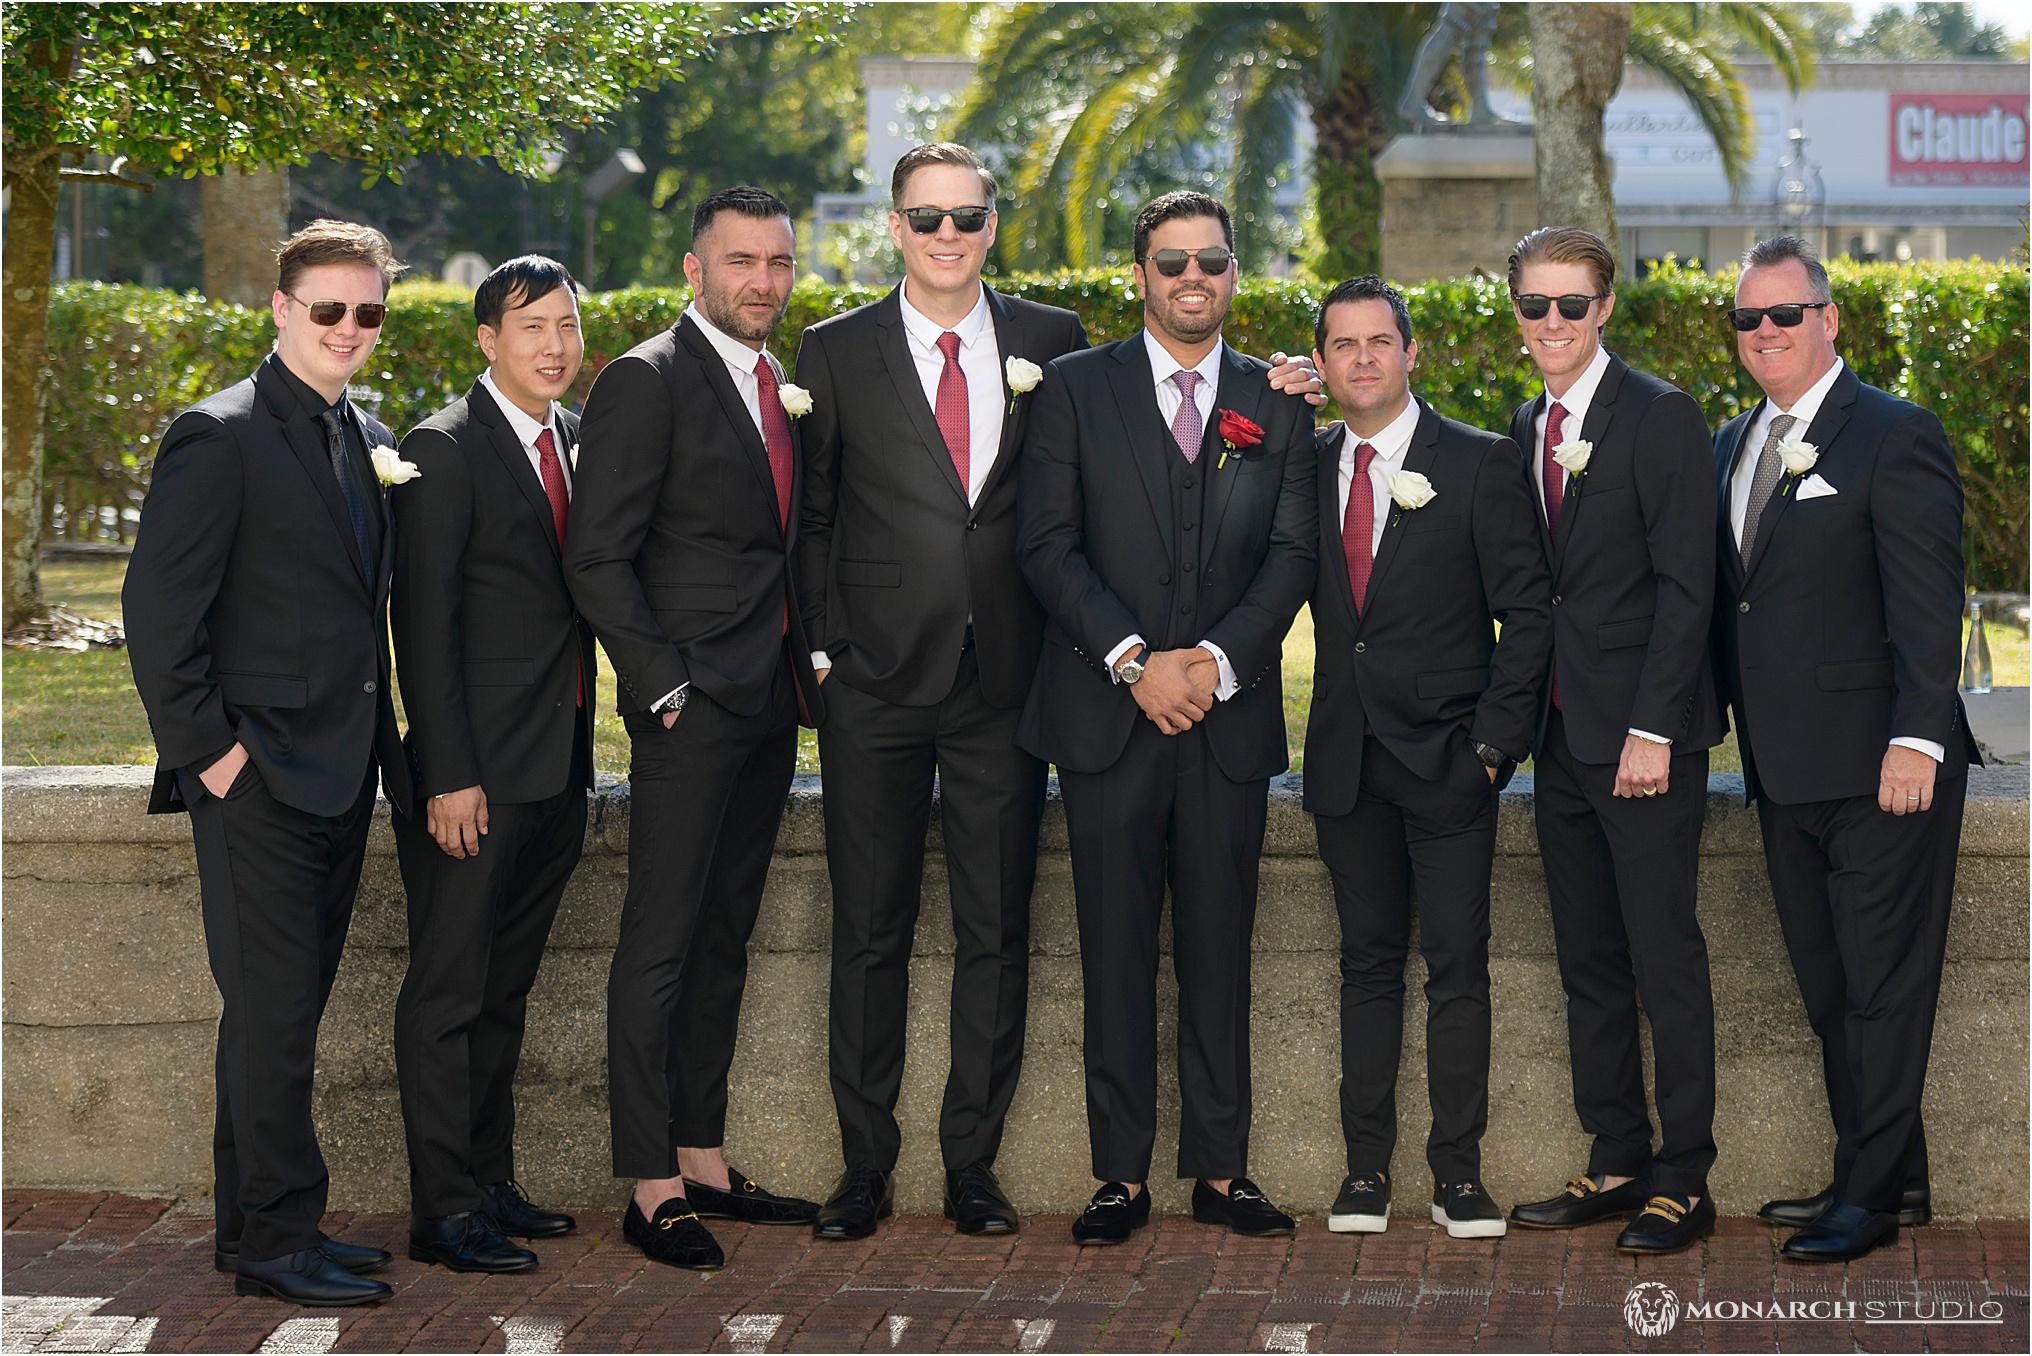 st-augustine-high-end-wedding-photographers-016.jpg